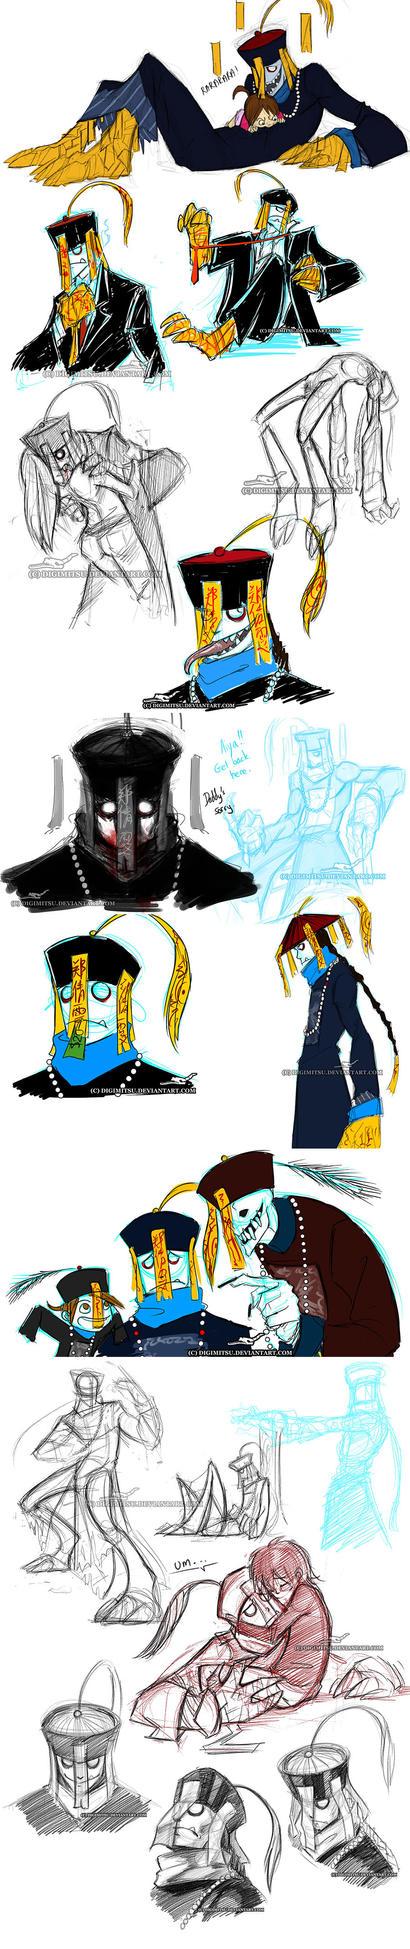 Mr China: Sketchdump 02 by Digimitsu